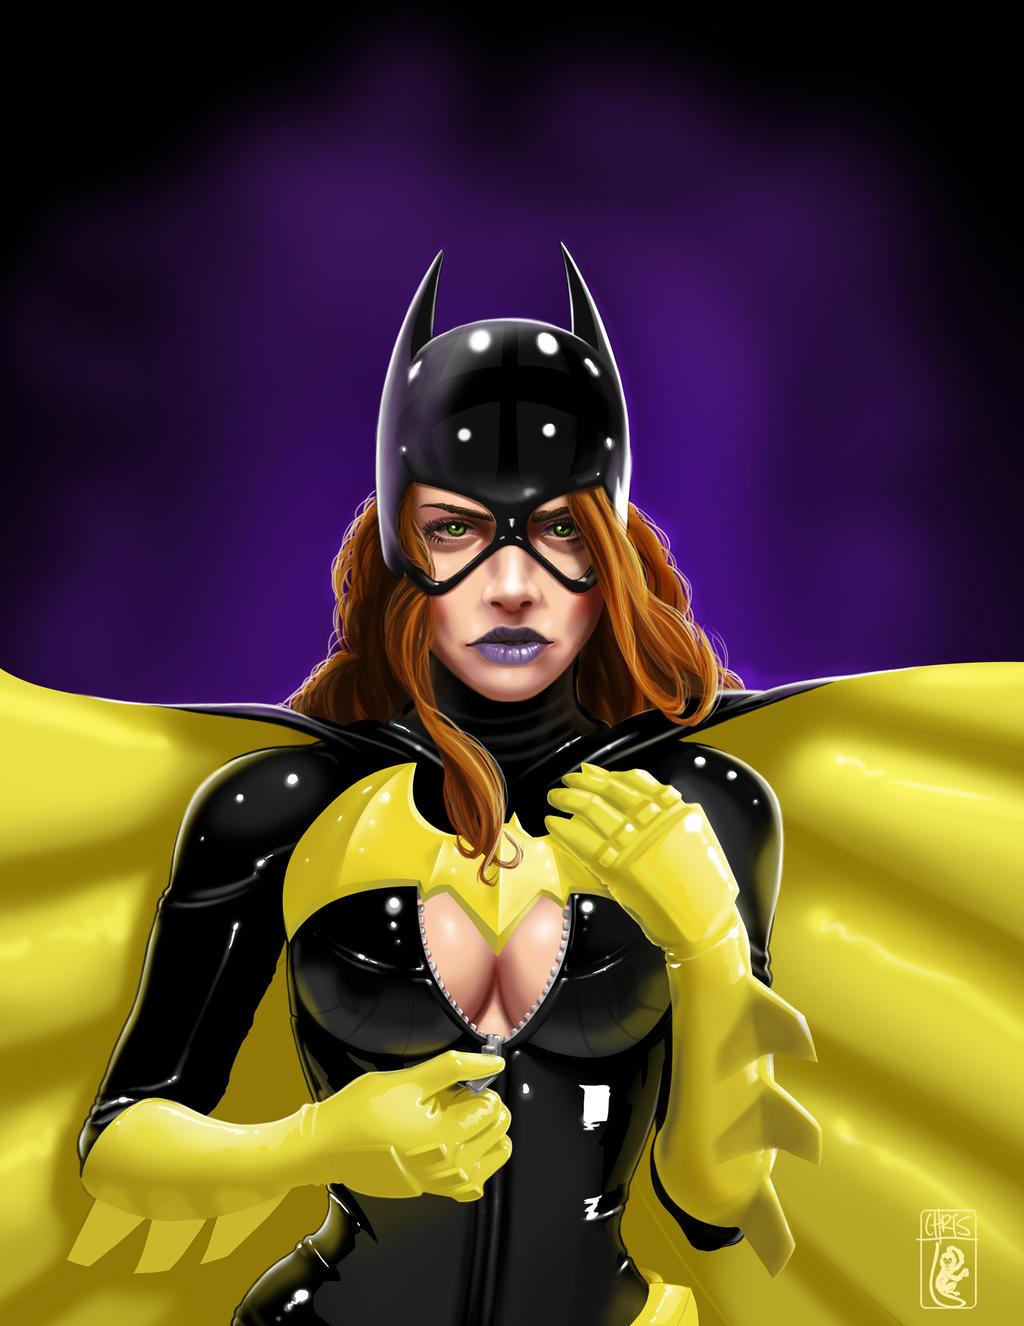 Xxx nude batgirl porn sex image